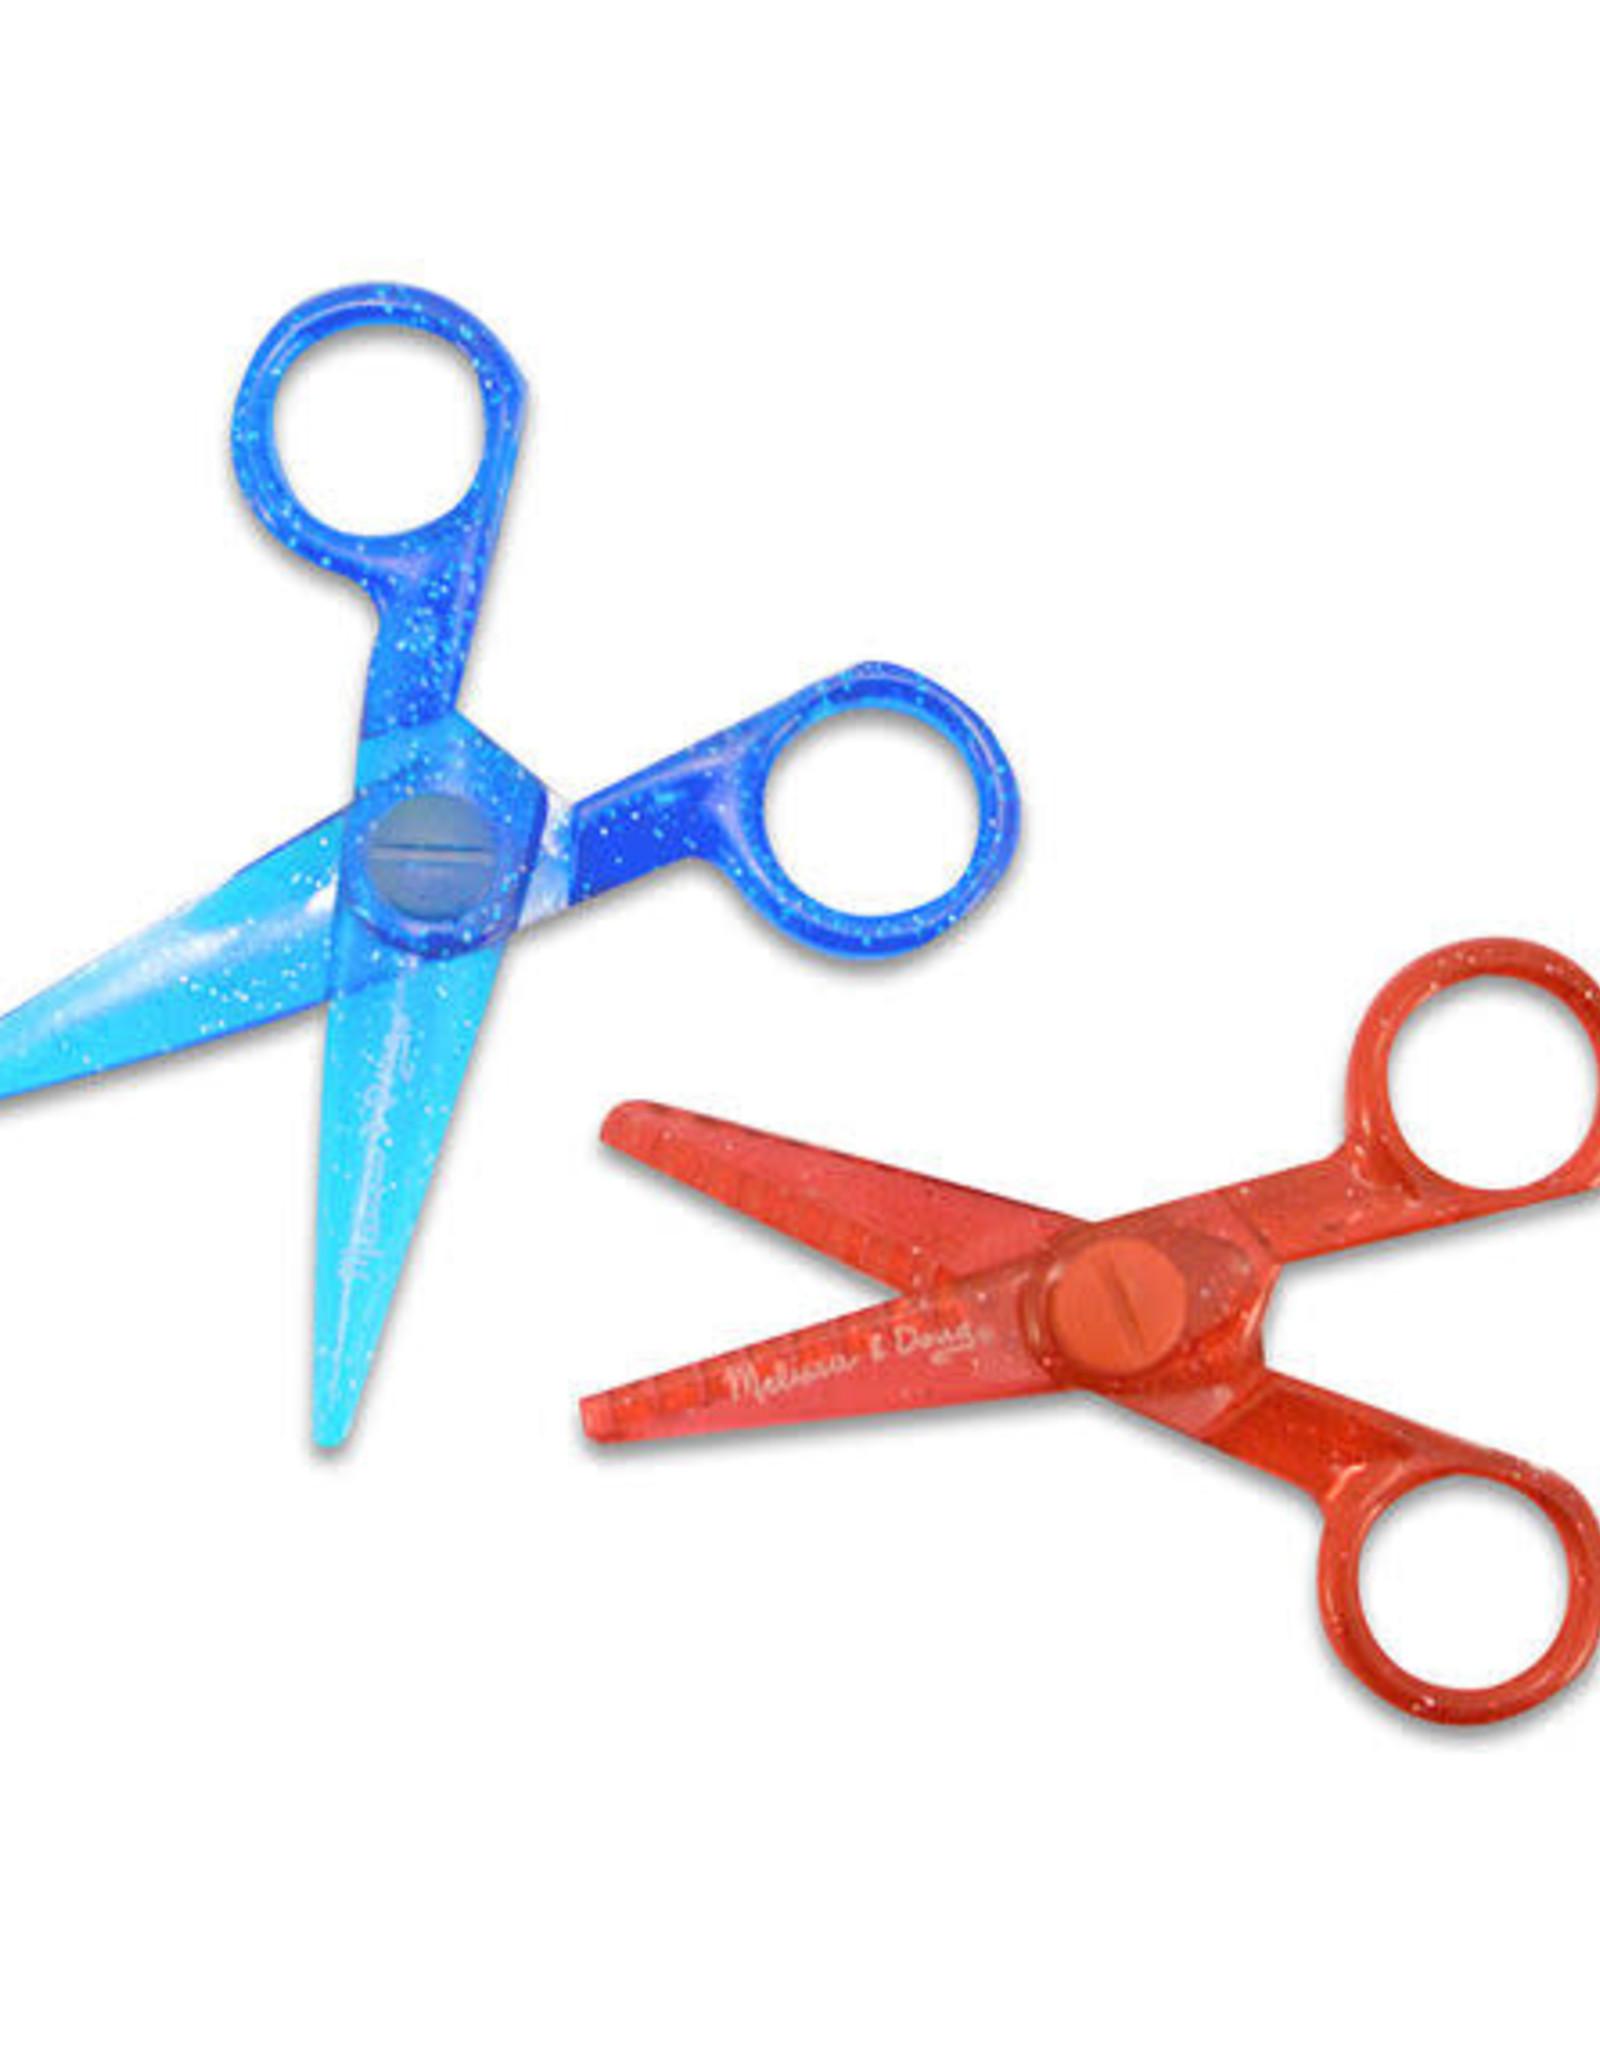 Melissa & Doug Melissa & Doug Child Safe Scissor Set